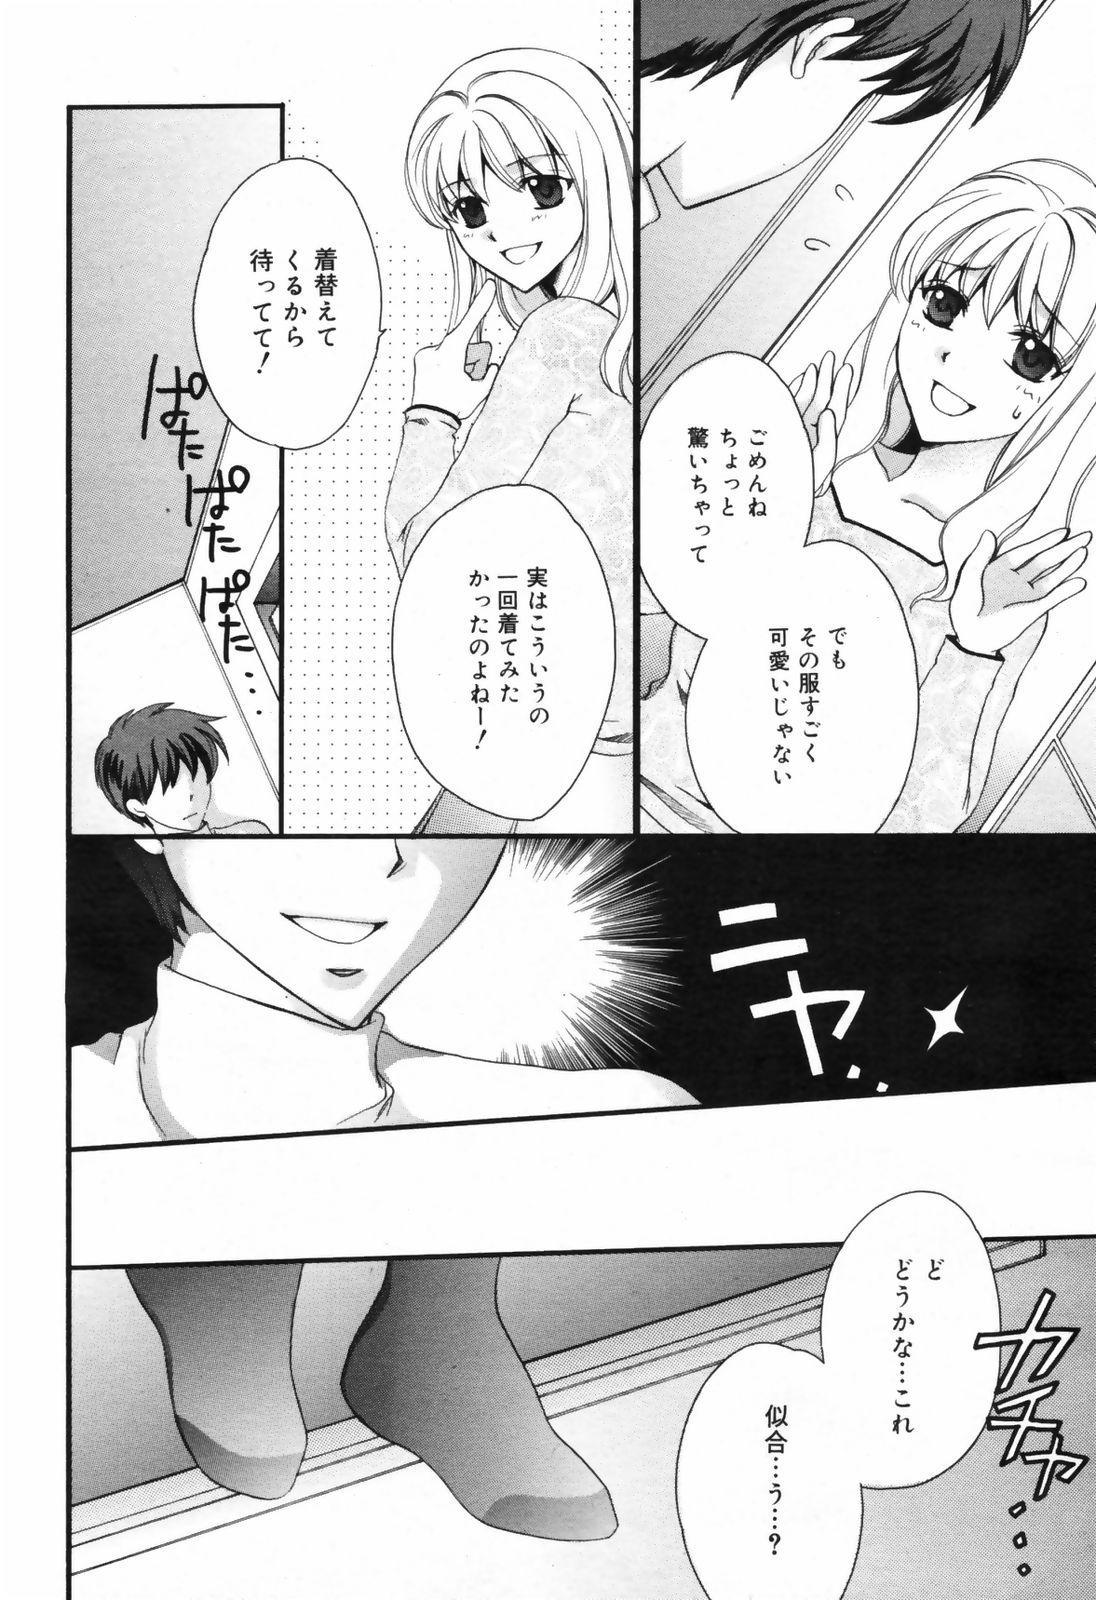 Manga Bangaichi 2009-02 Vol. 234 207